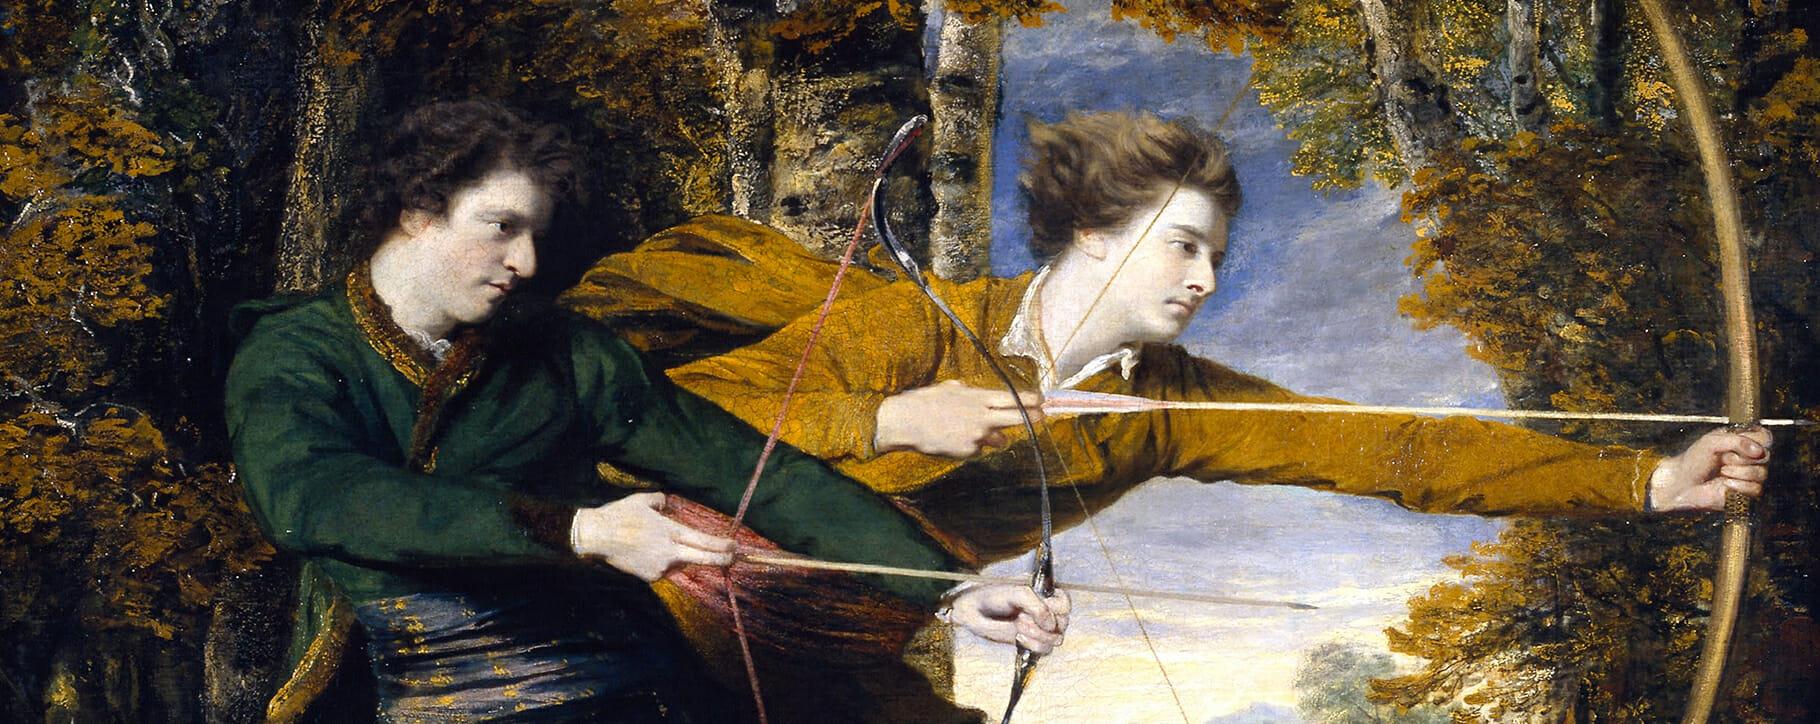 Joshua Reynolds Archers Portrait